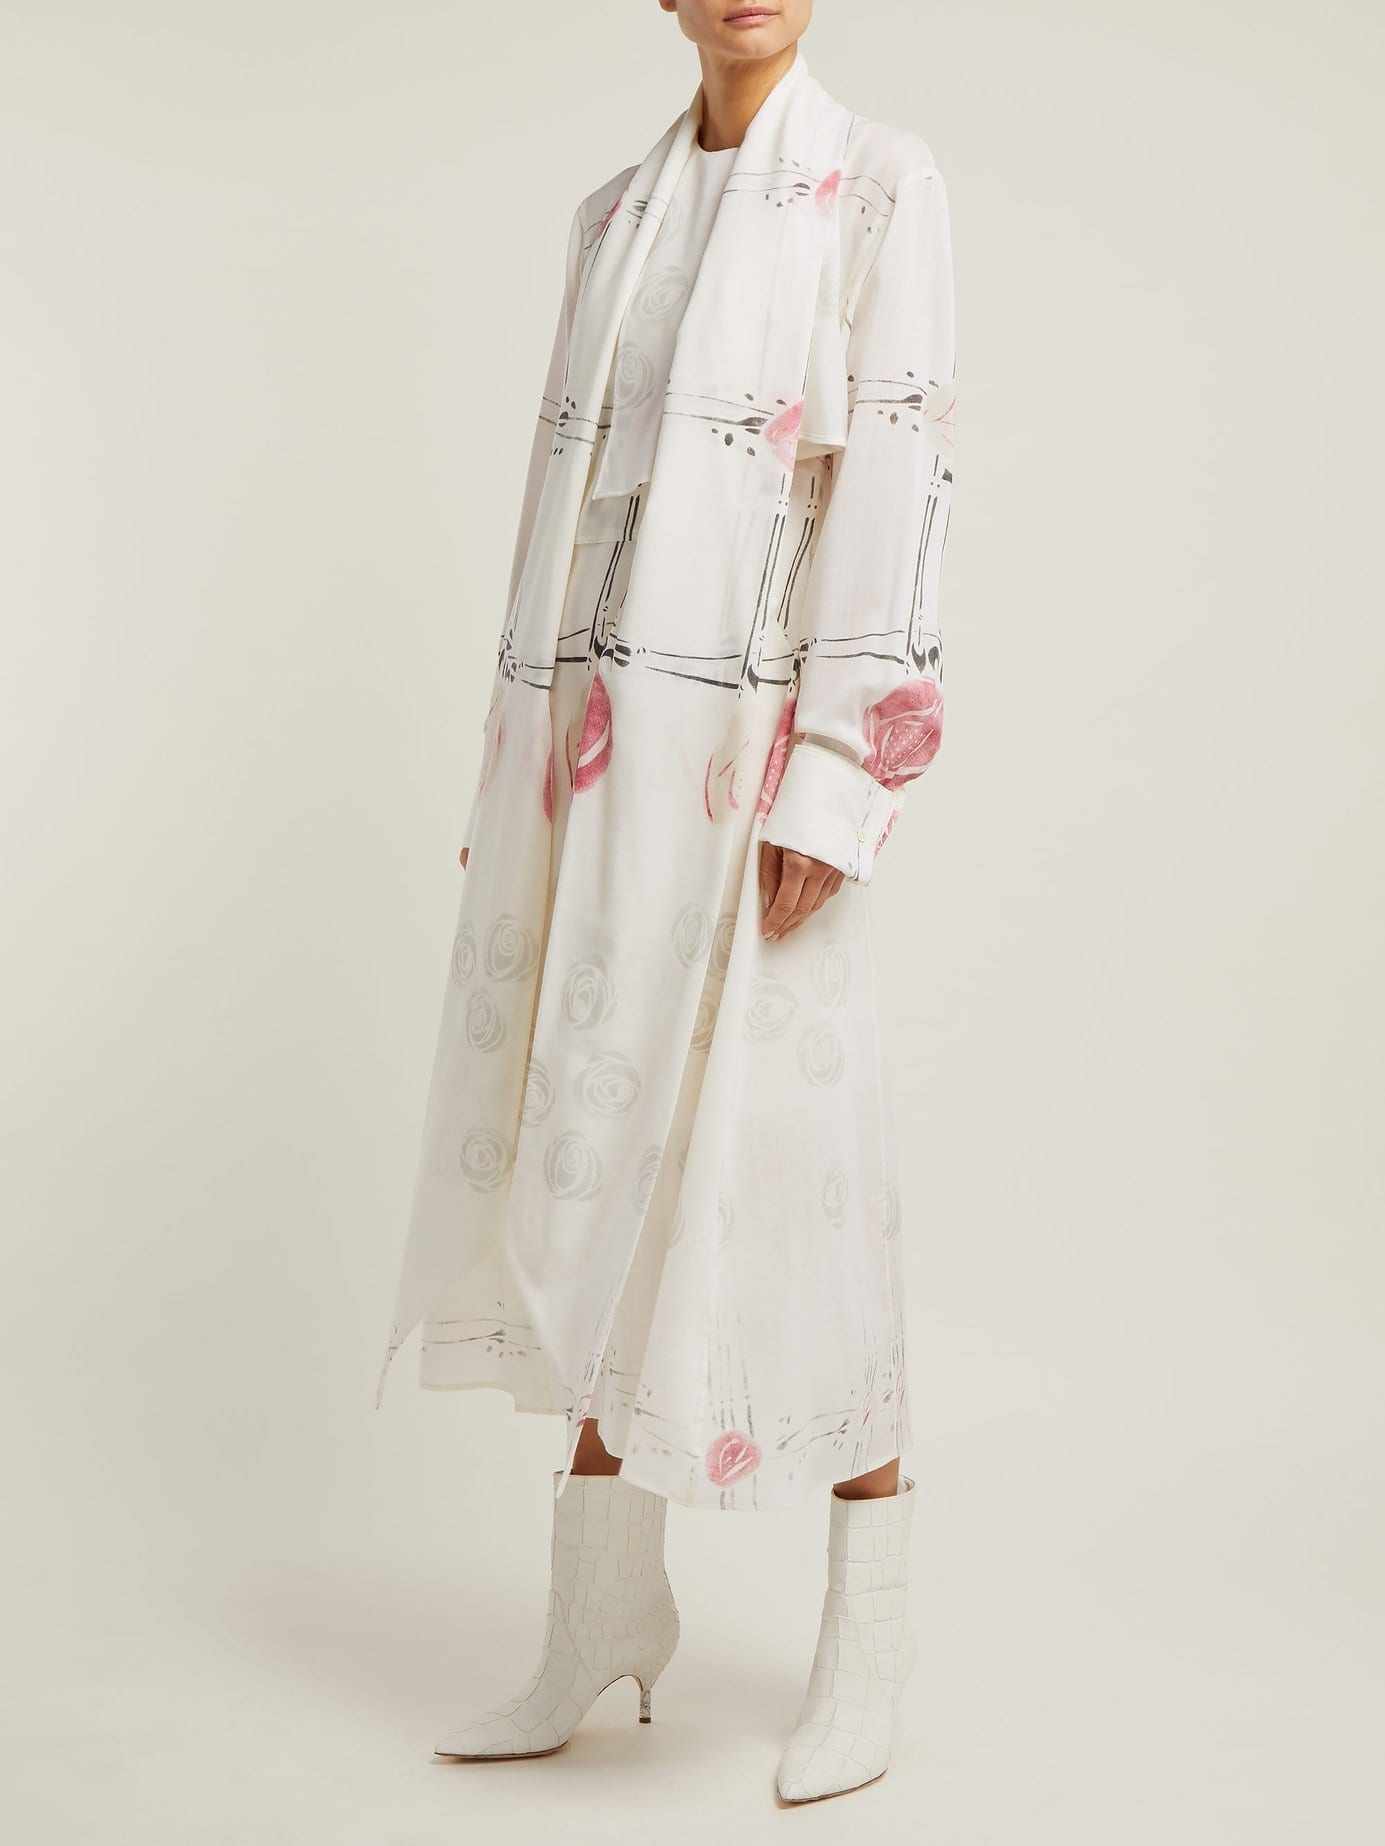 LOEWE X Charles Rennie Mackintosh Rose-print Wool Ivory Dress